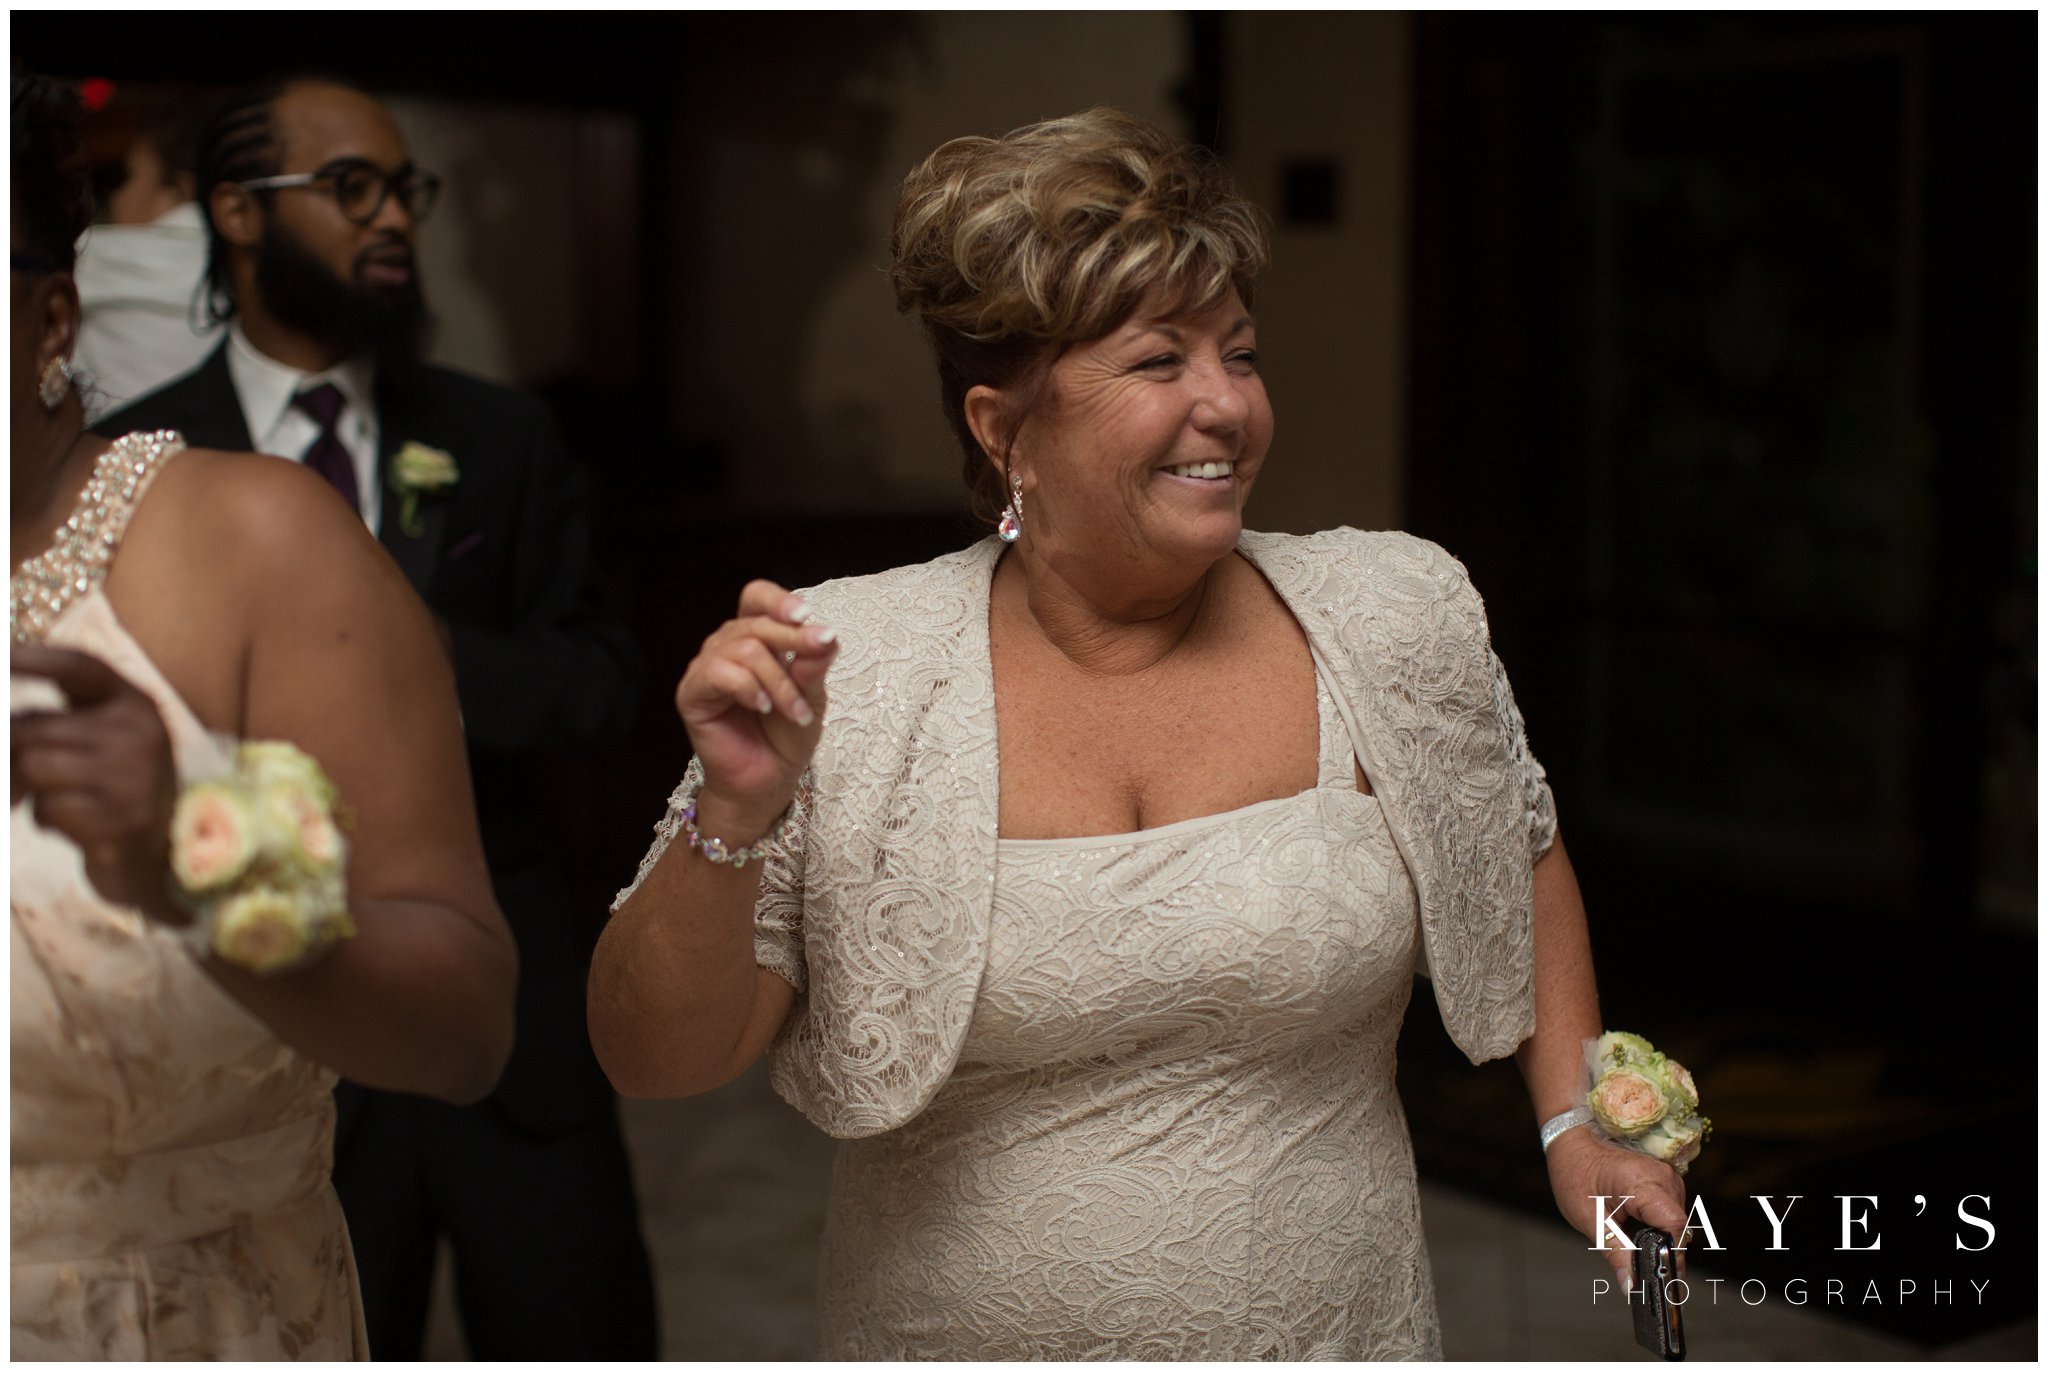 Kayes Photography- howell-michigan-wedding-photographer_0657.jpg